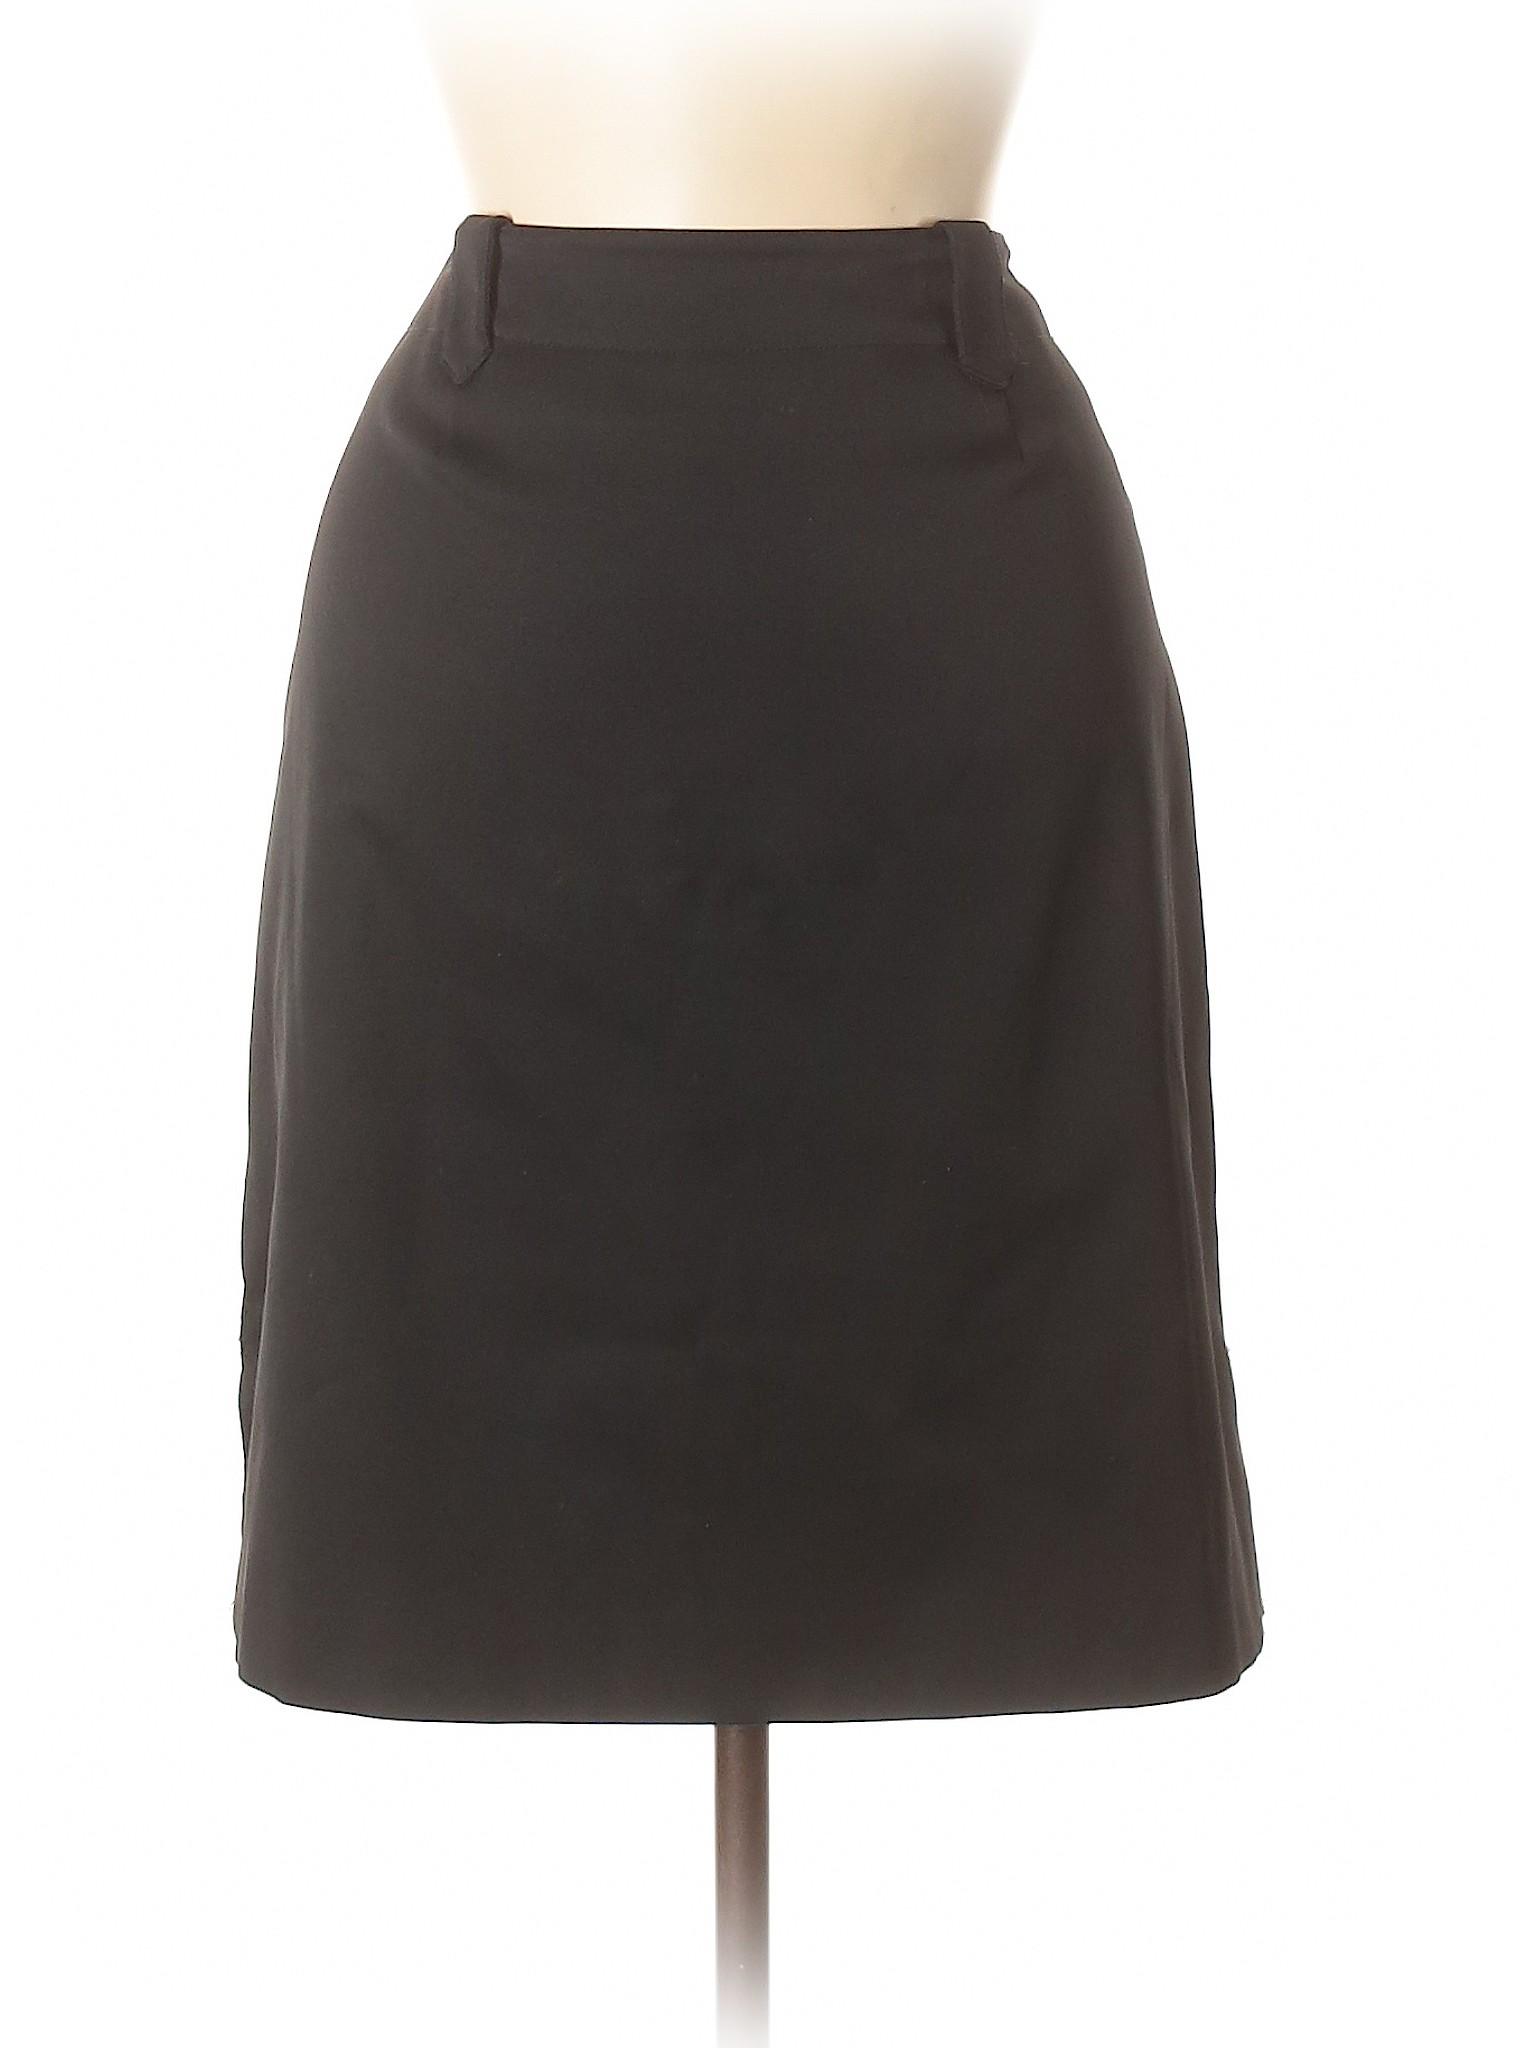 Skirt Skirt Boutique Casual Boutique Casual Skirt Boutique Casual Casual Skirt Boutique qx1awxZA